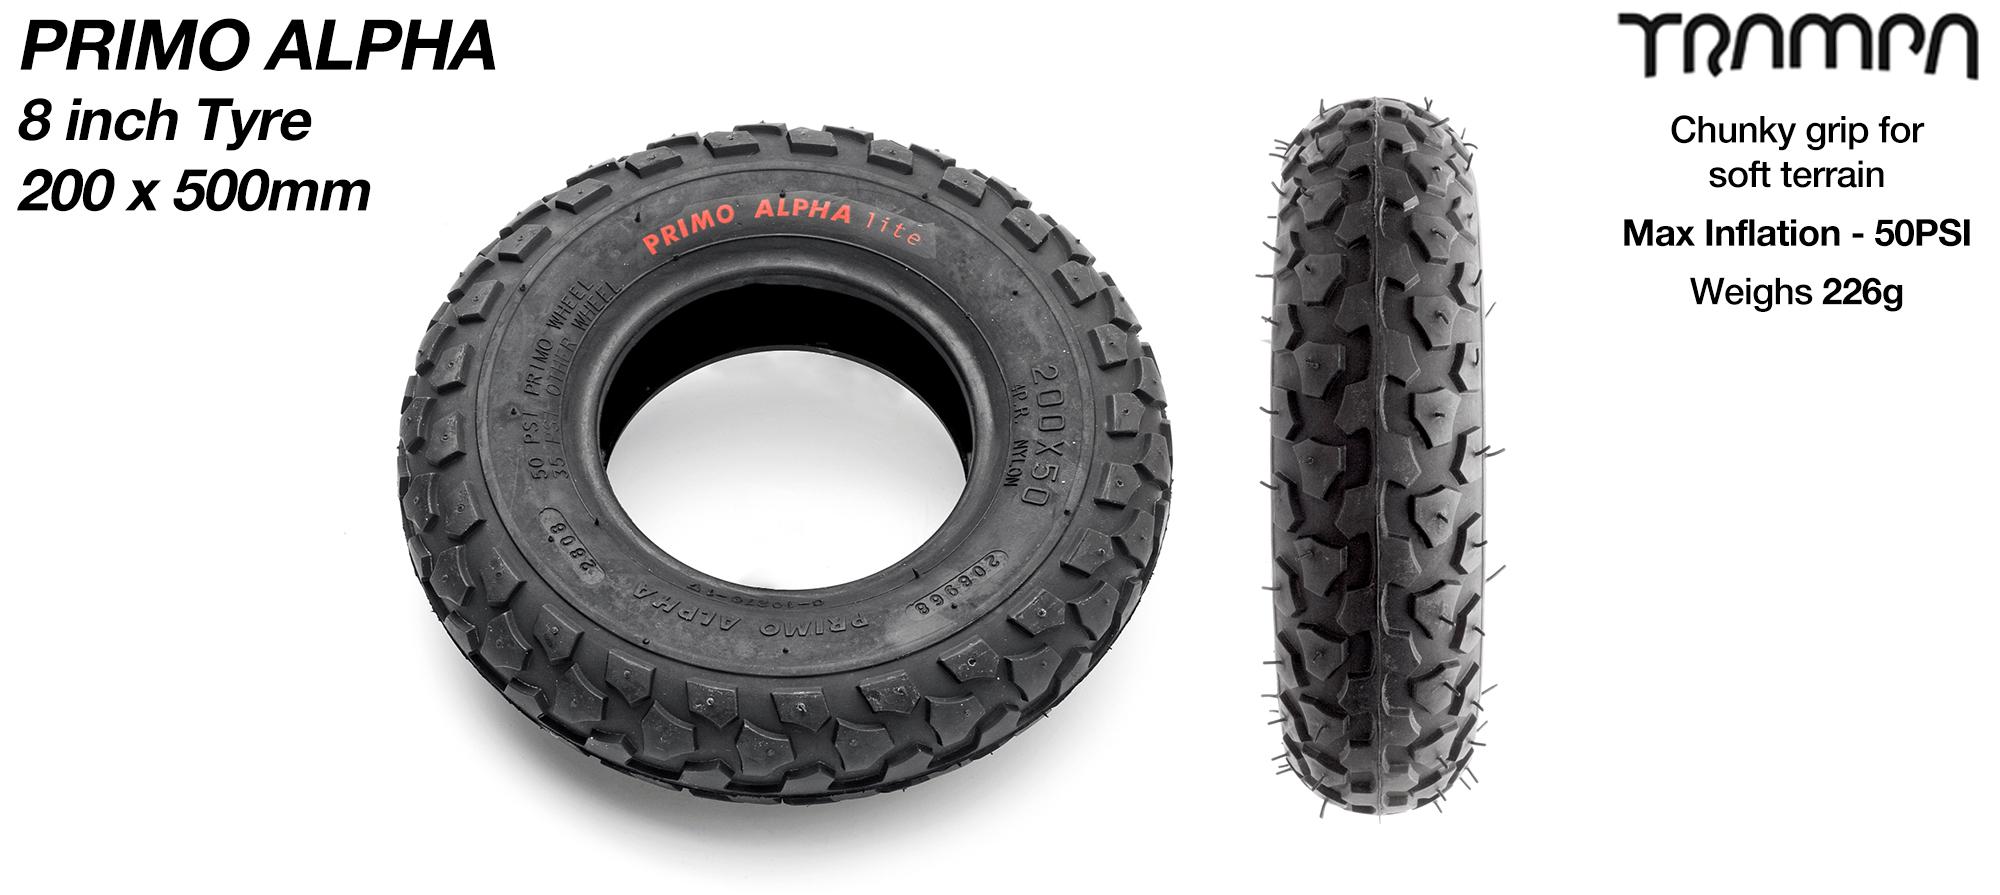 PRIMO ALPHA Lite - BLACK 8x 2x 3.75 - 8 Inch Tyre - Premium 8 Inch Tyres All purpose Dirt Tyres